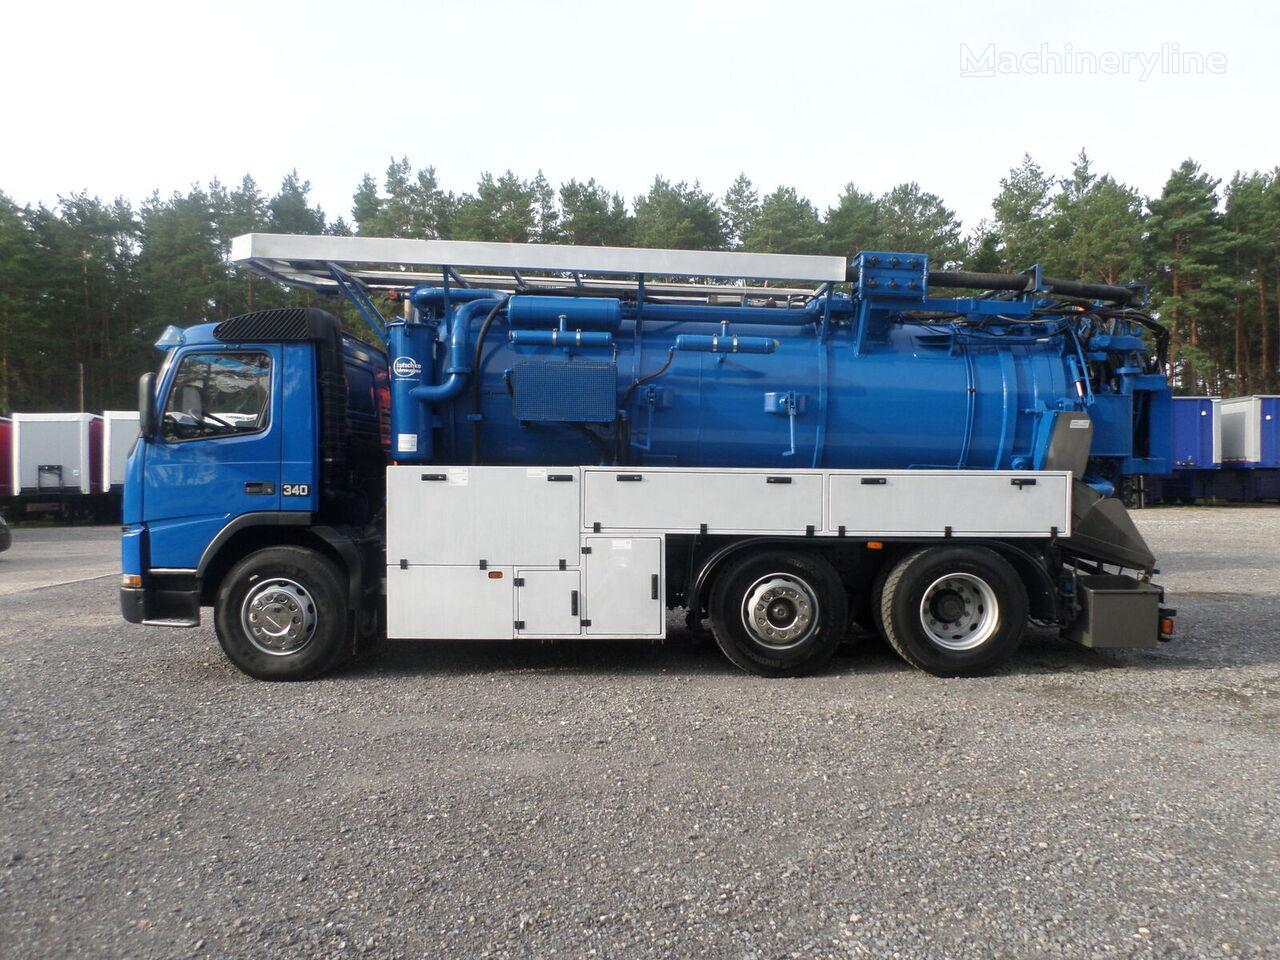 VOLVO FM 340 Kutschke WUKO Water recycling sewer jetter truck